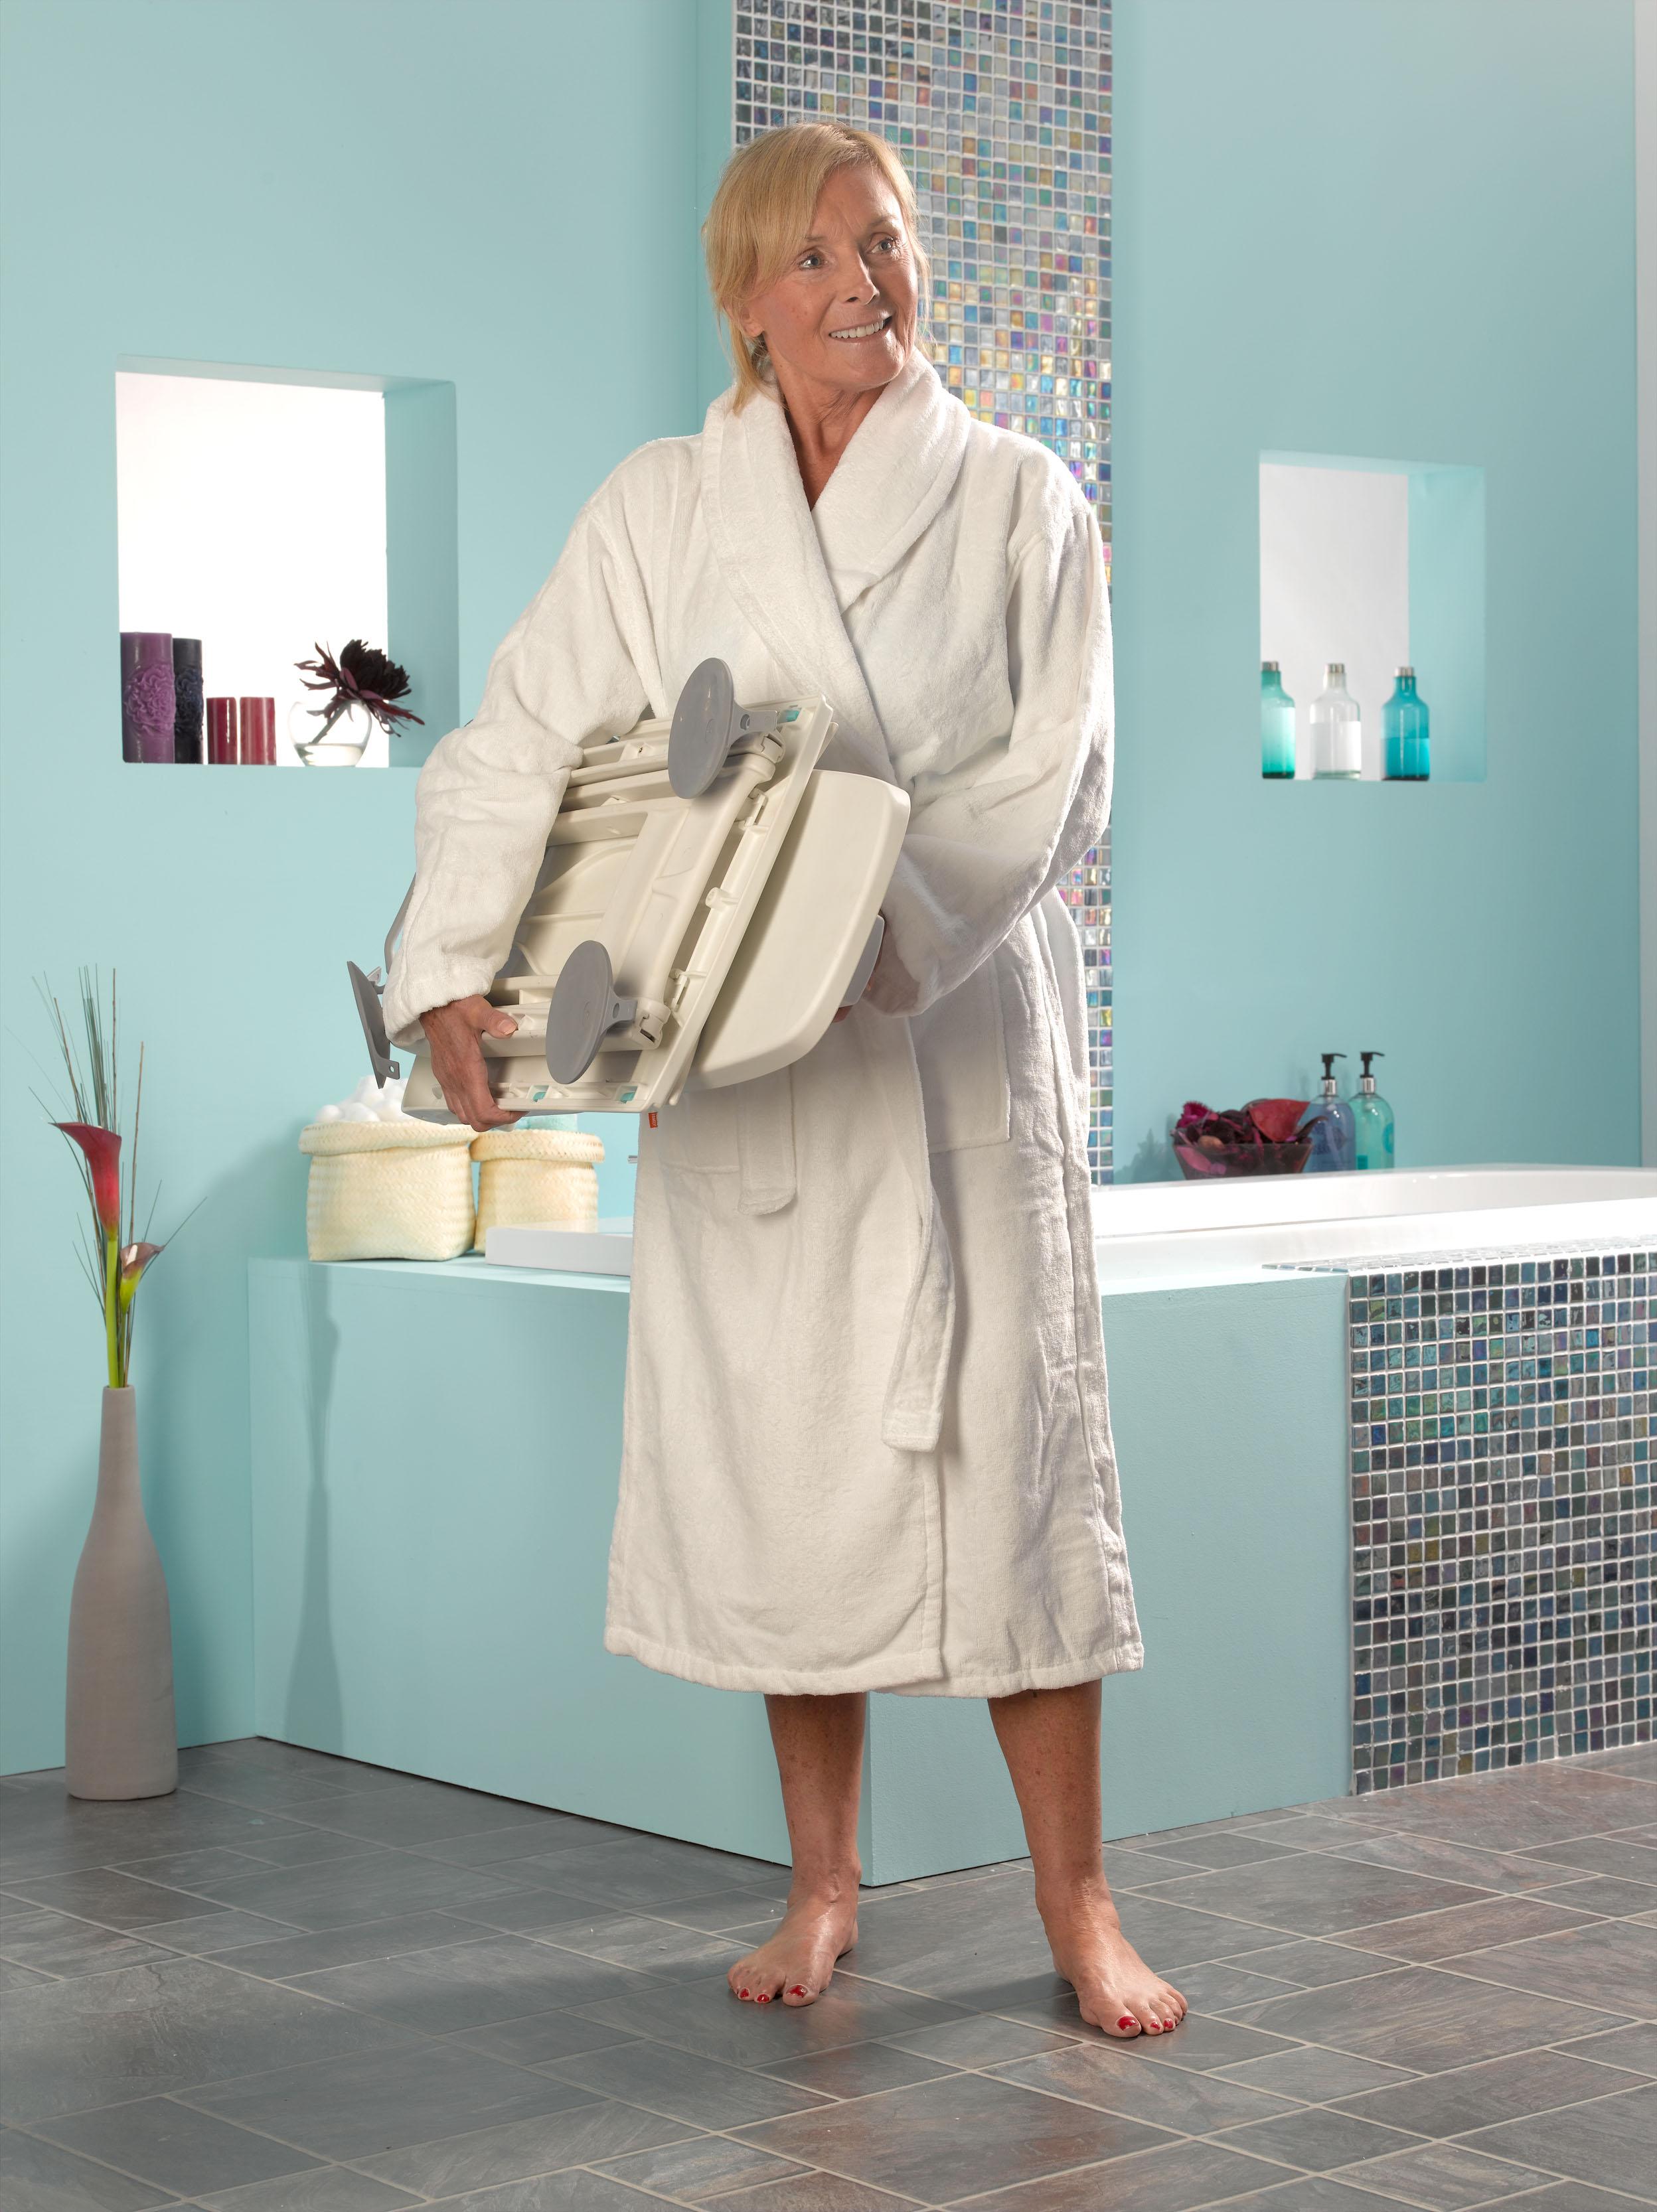 aquila-compact-carry-bath-lift.jpg